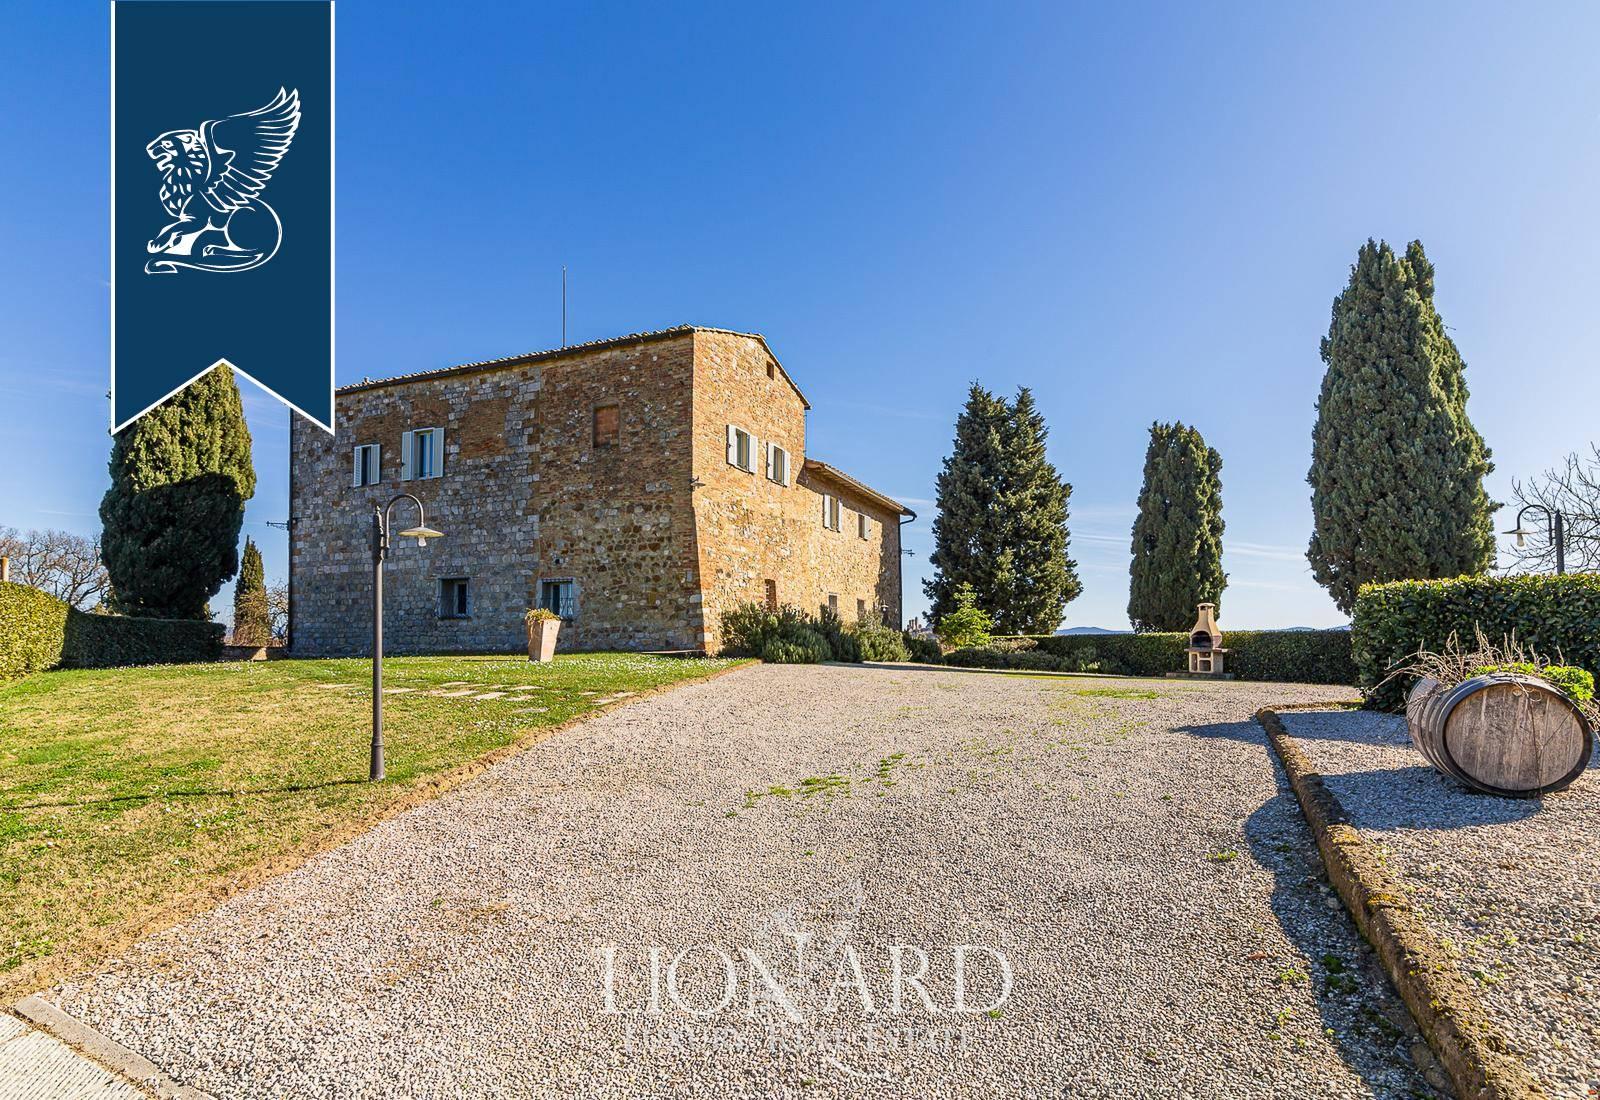 Agriturismo in Vendita a San Gimignano: 0 locali, 649 mq - Foto 3